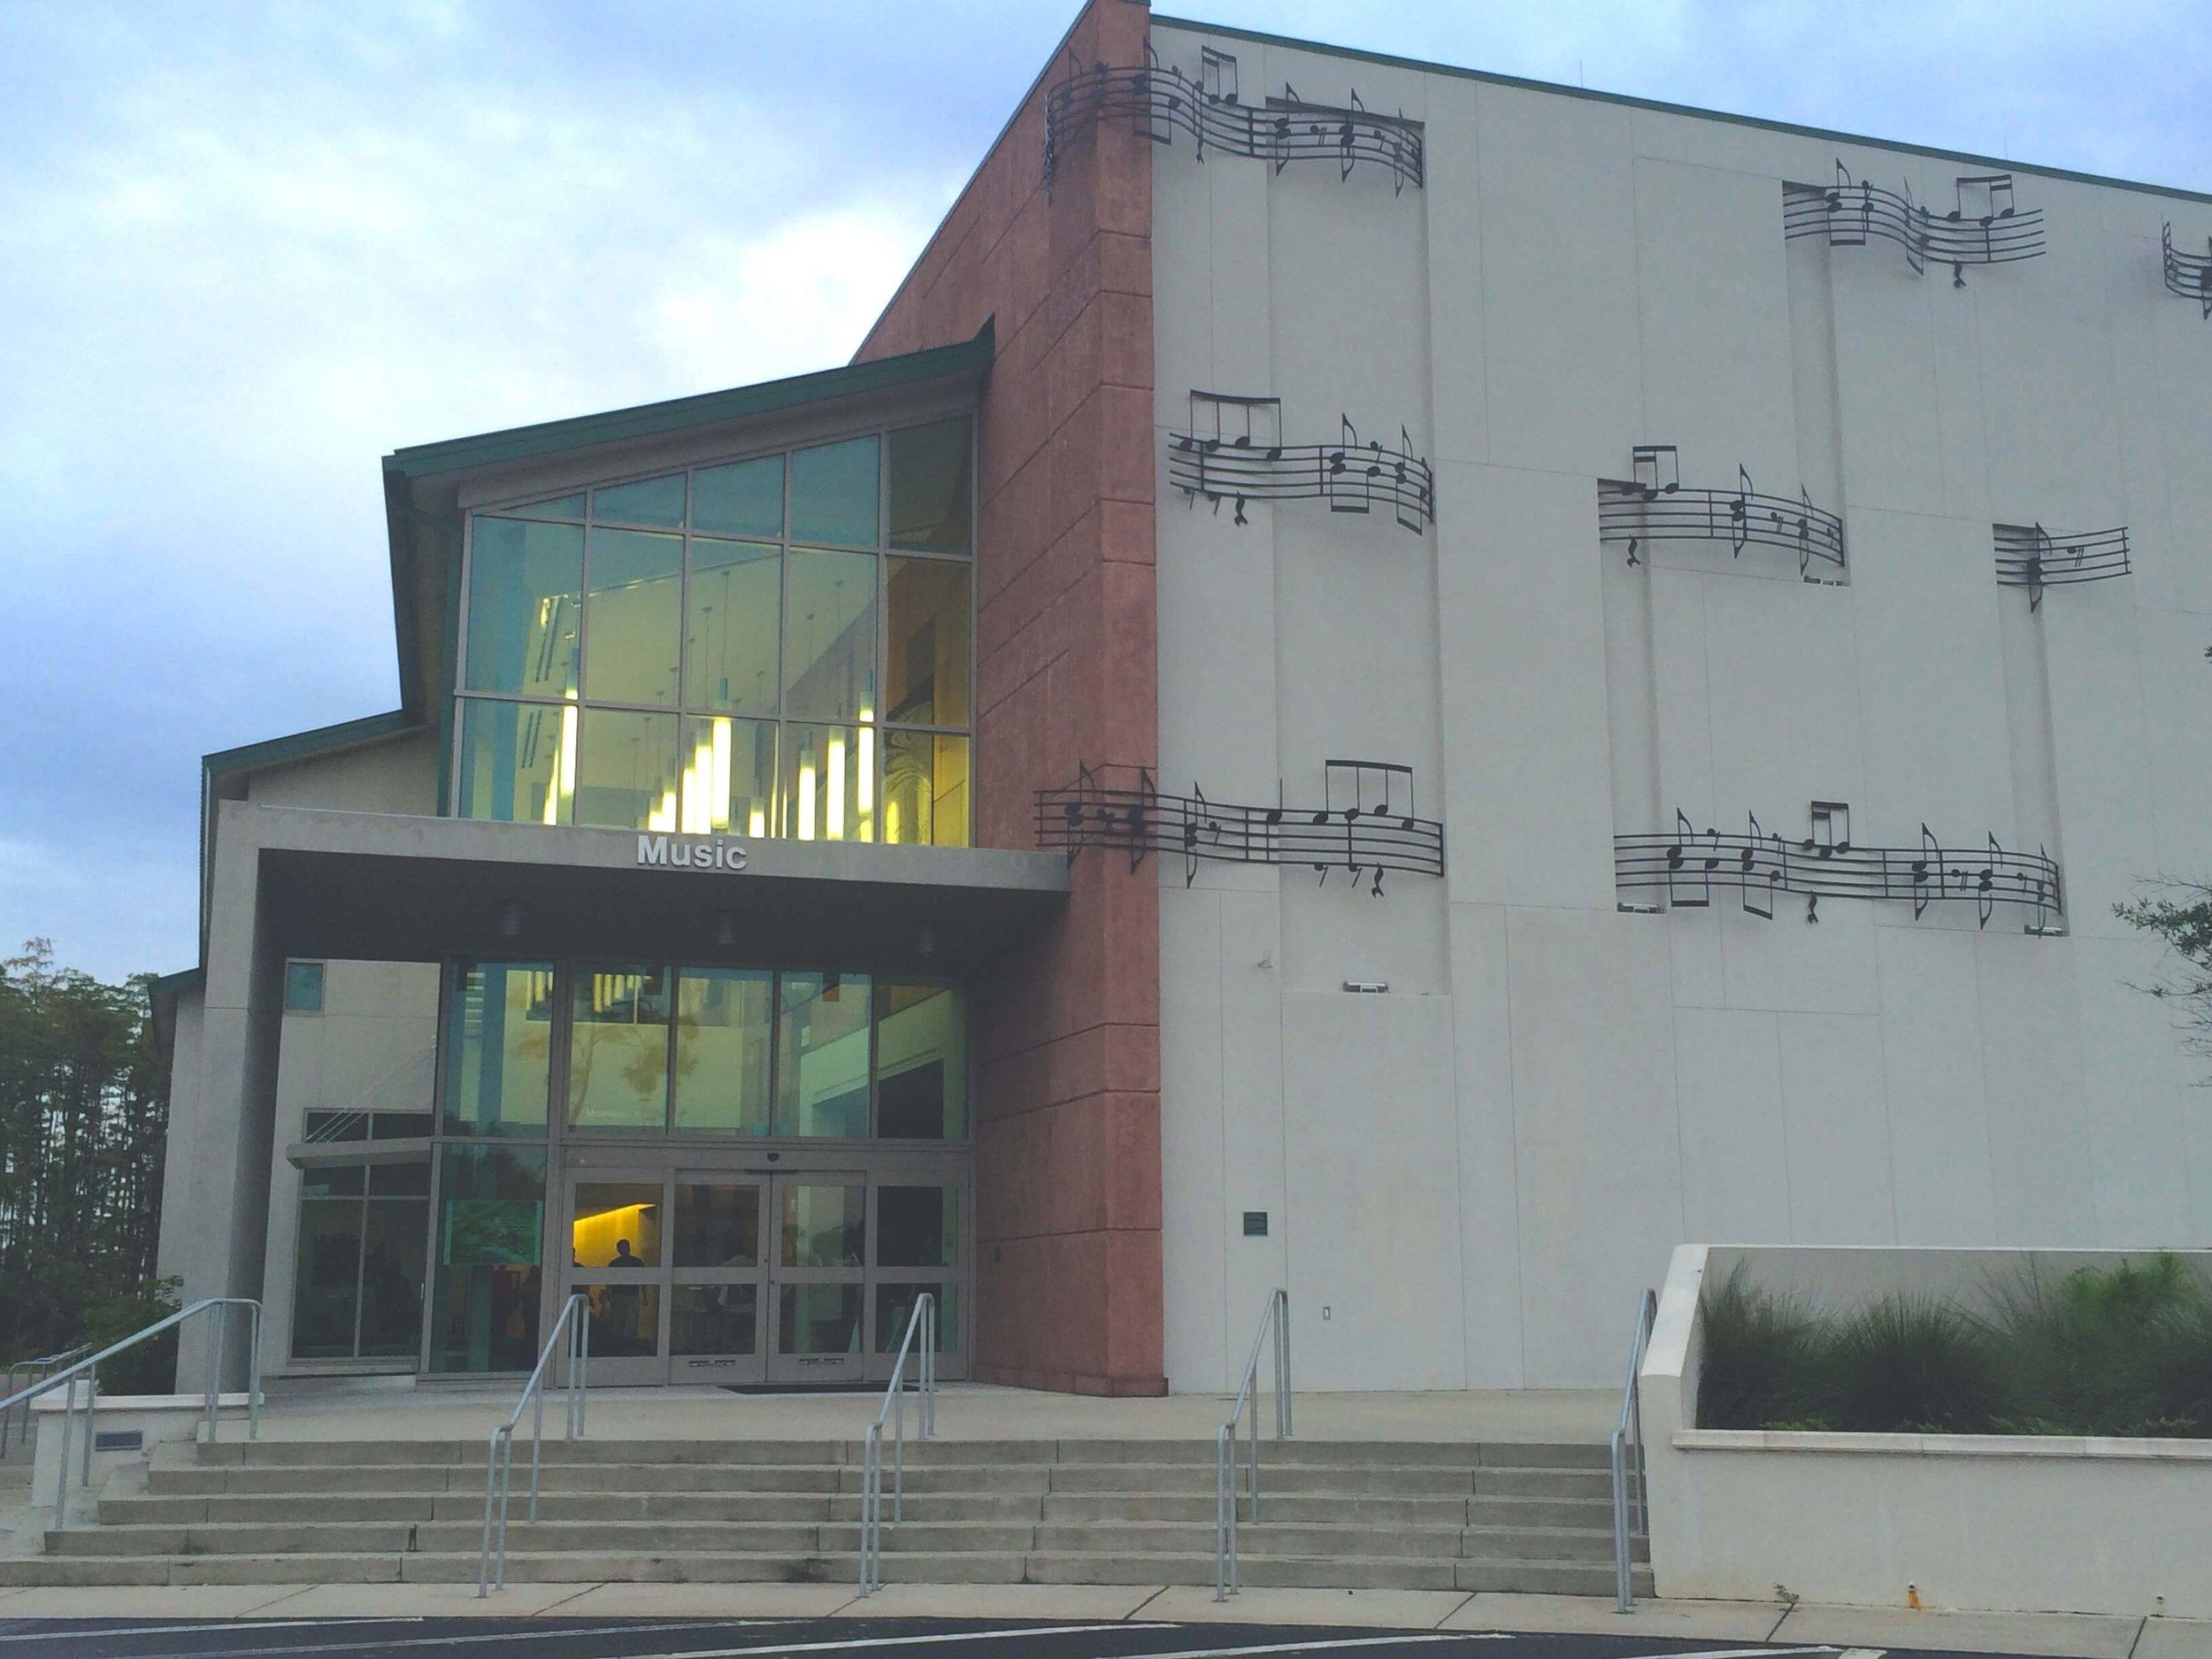 FGCU - Bower School of Music & The Arts